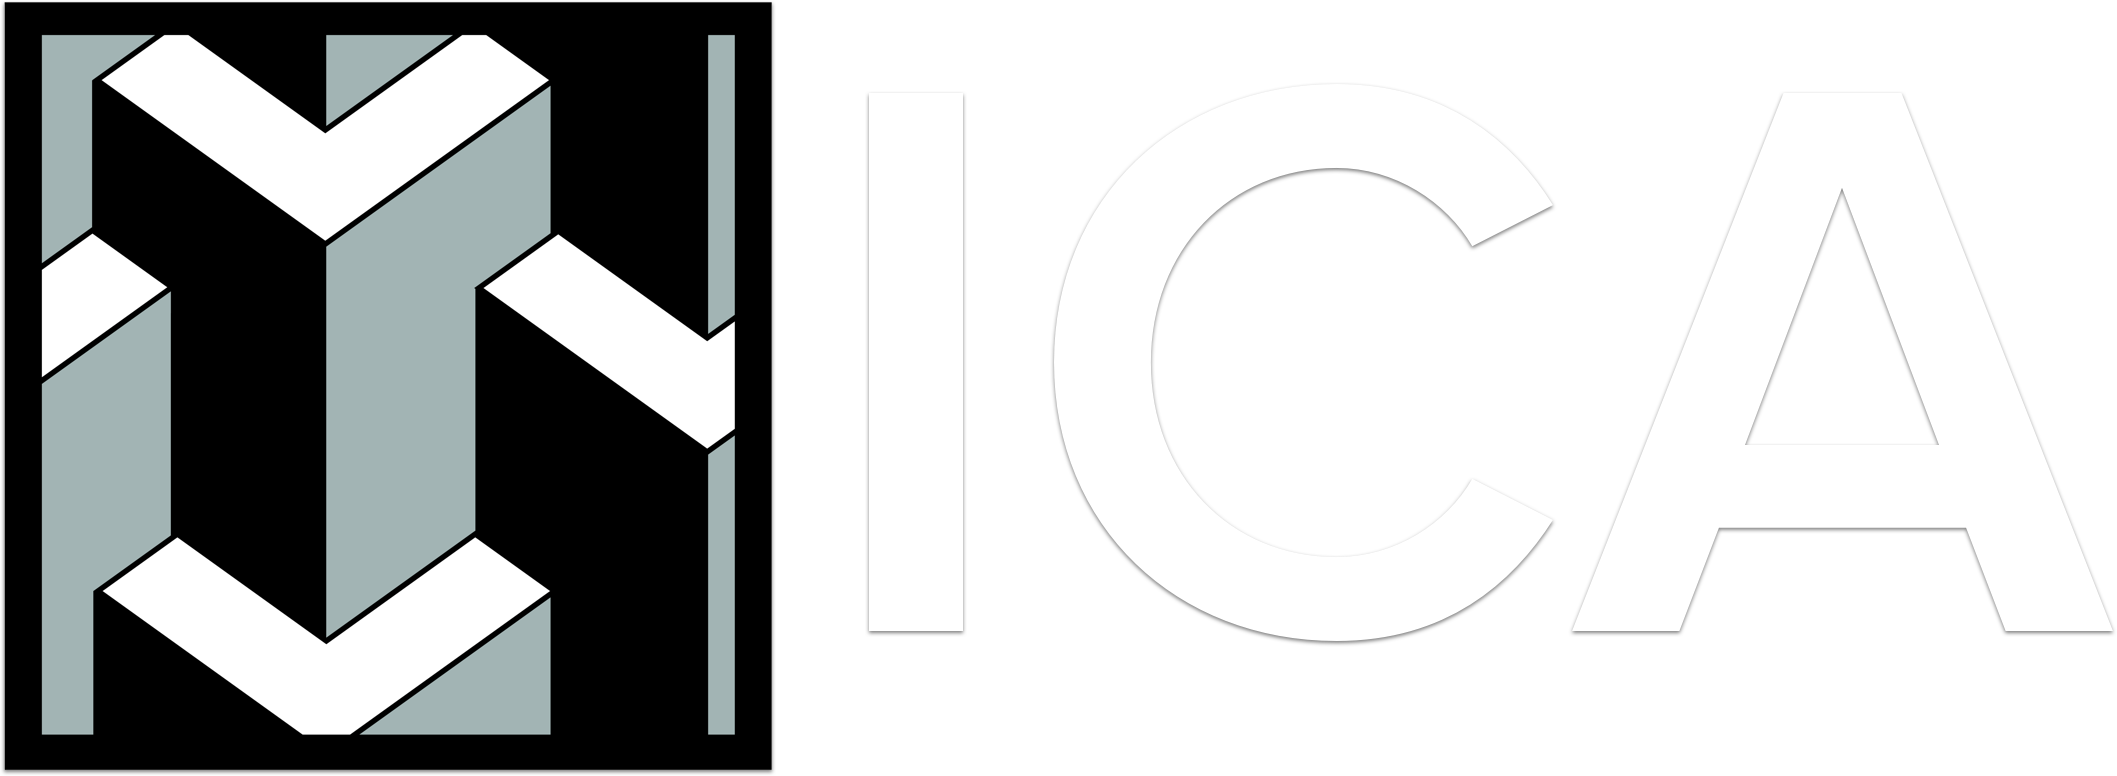 ica inversiones logo.png